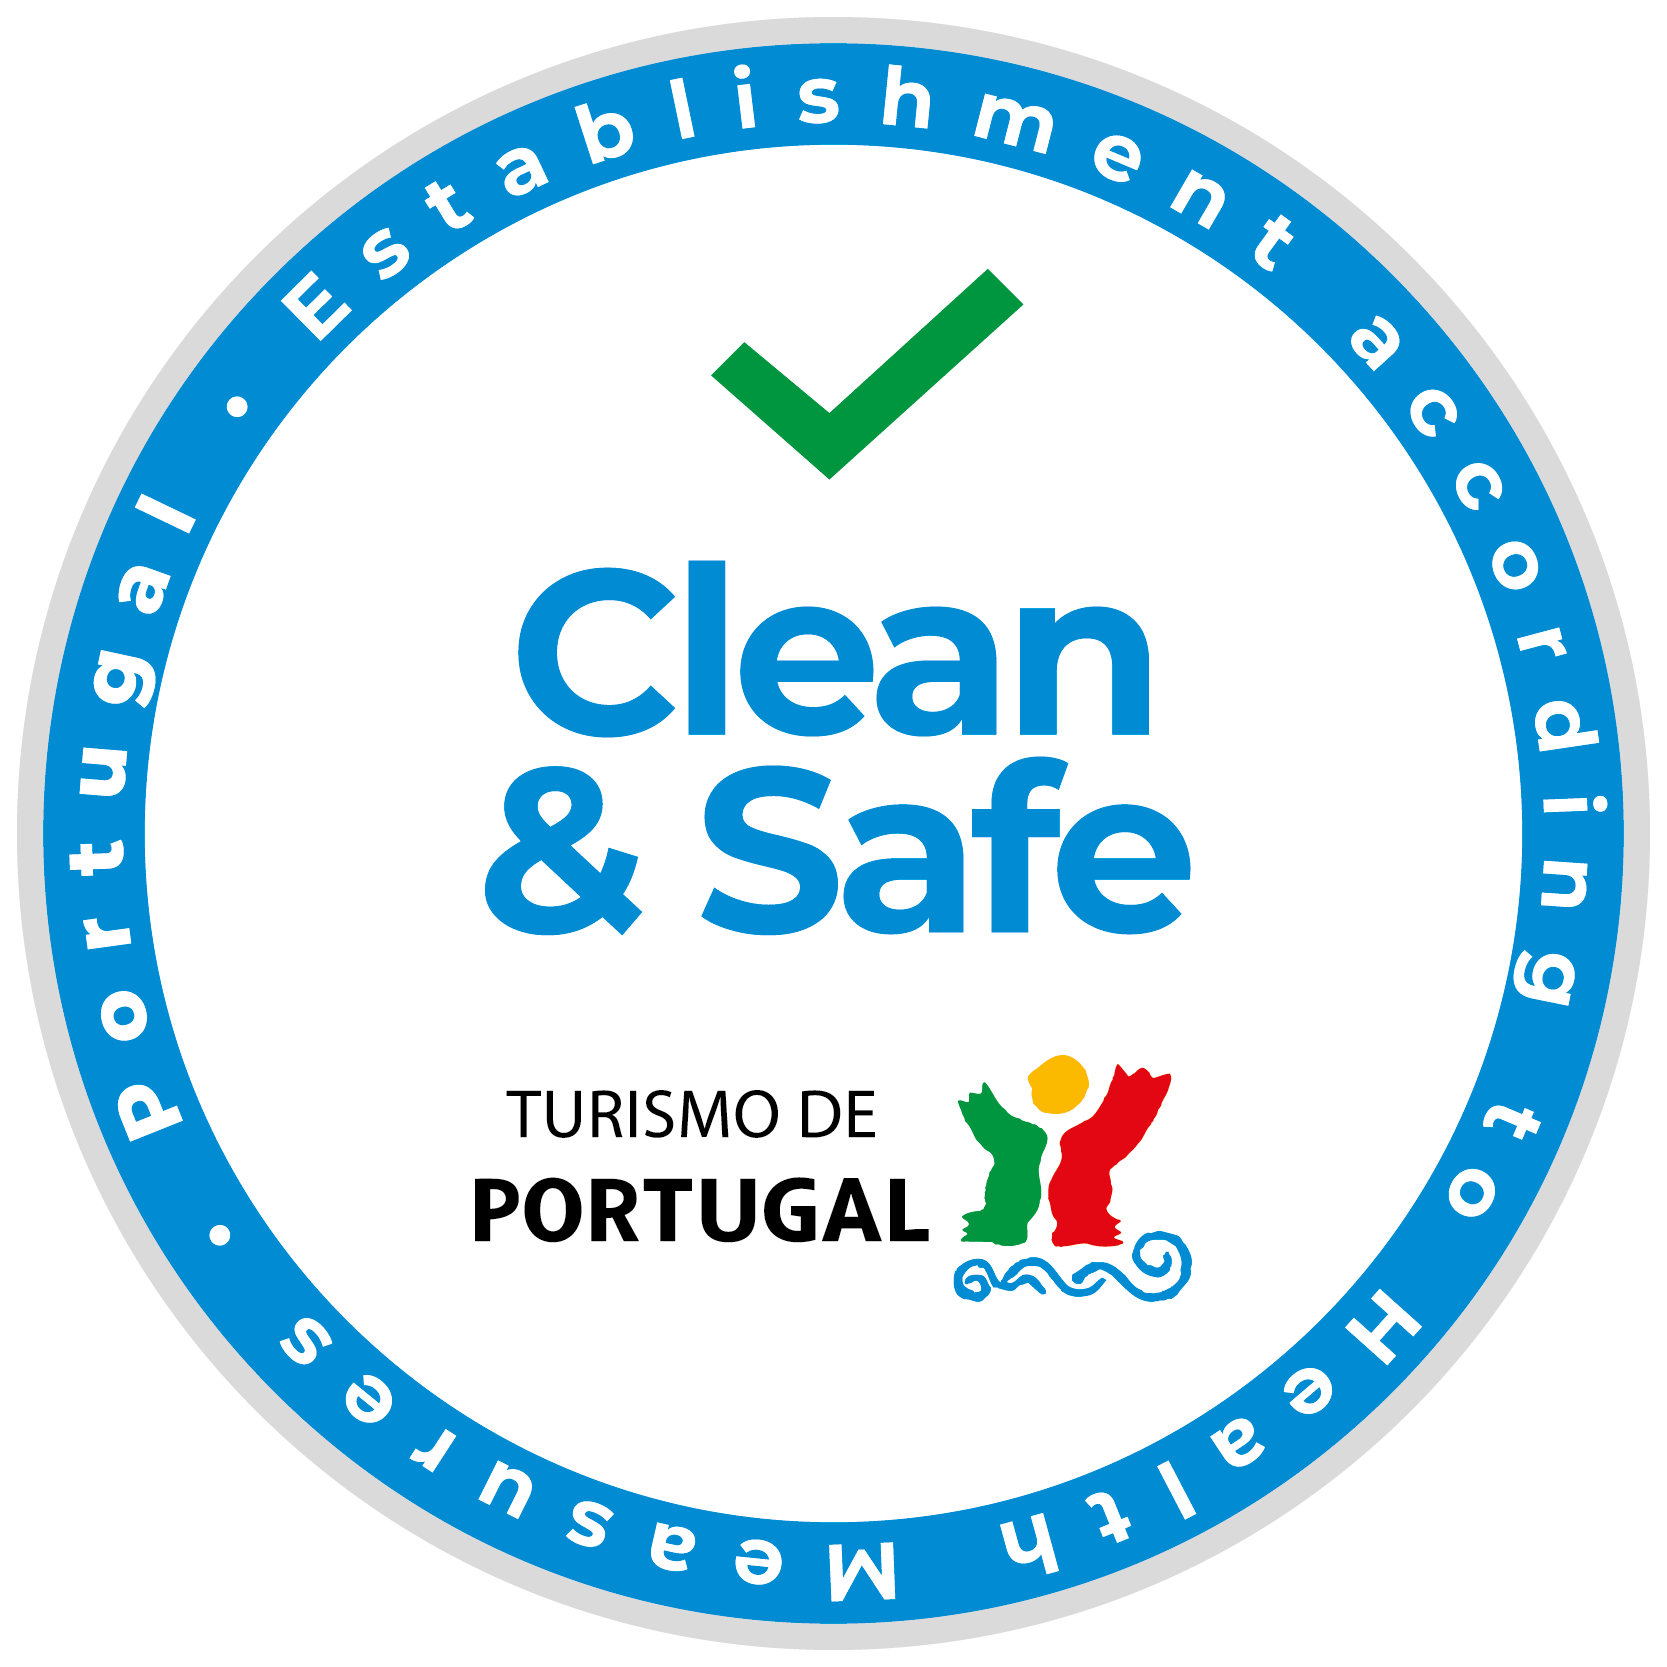 Turismo de Portugal clean and safe logo